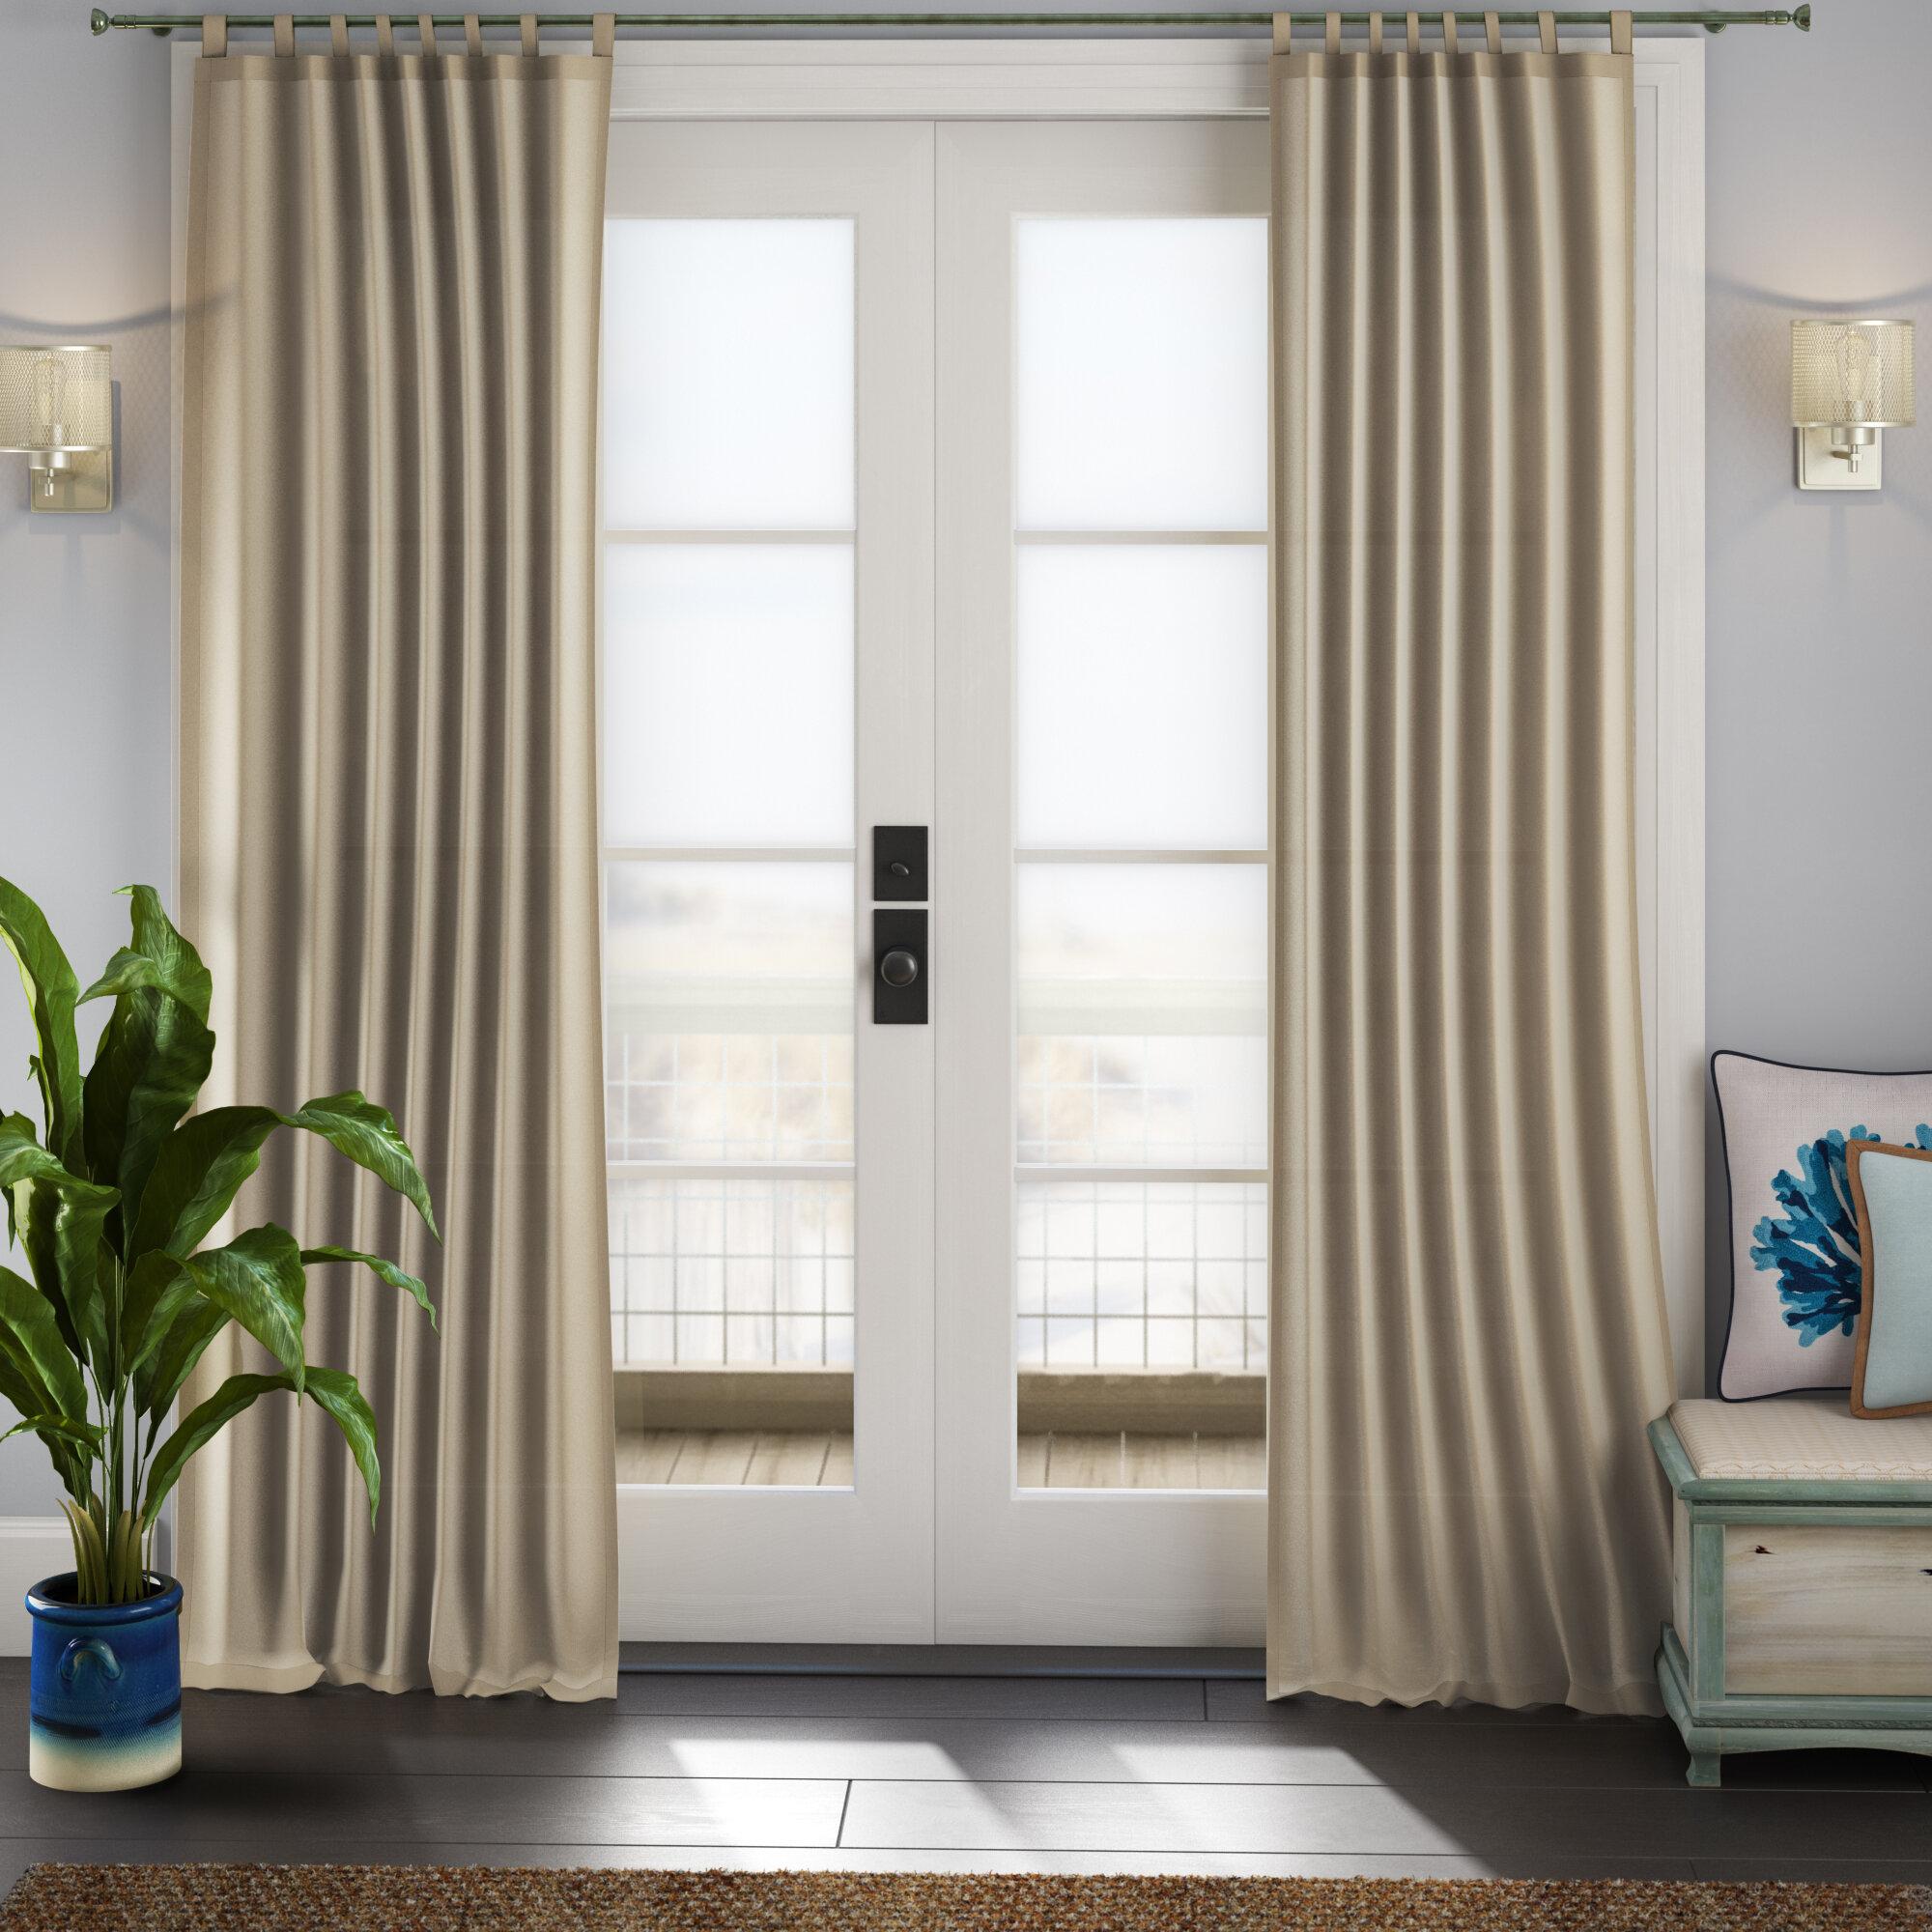 Sinead Indoor/outdoor Solid Room Darkening Tab Top Single Curtain Panel Throughout Matine Indoor/outdoor Curtain Panels (View 12 of 20)